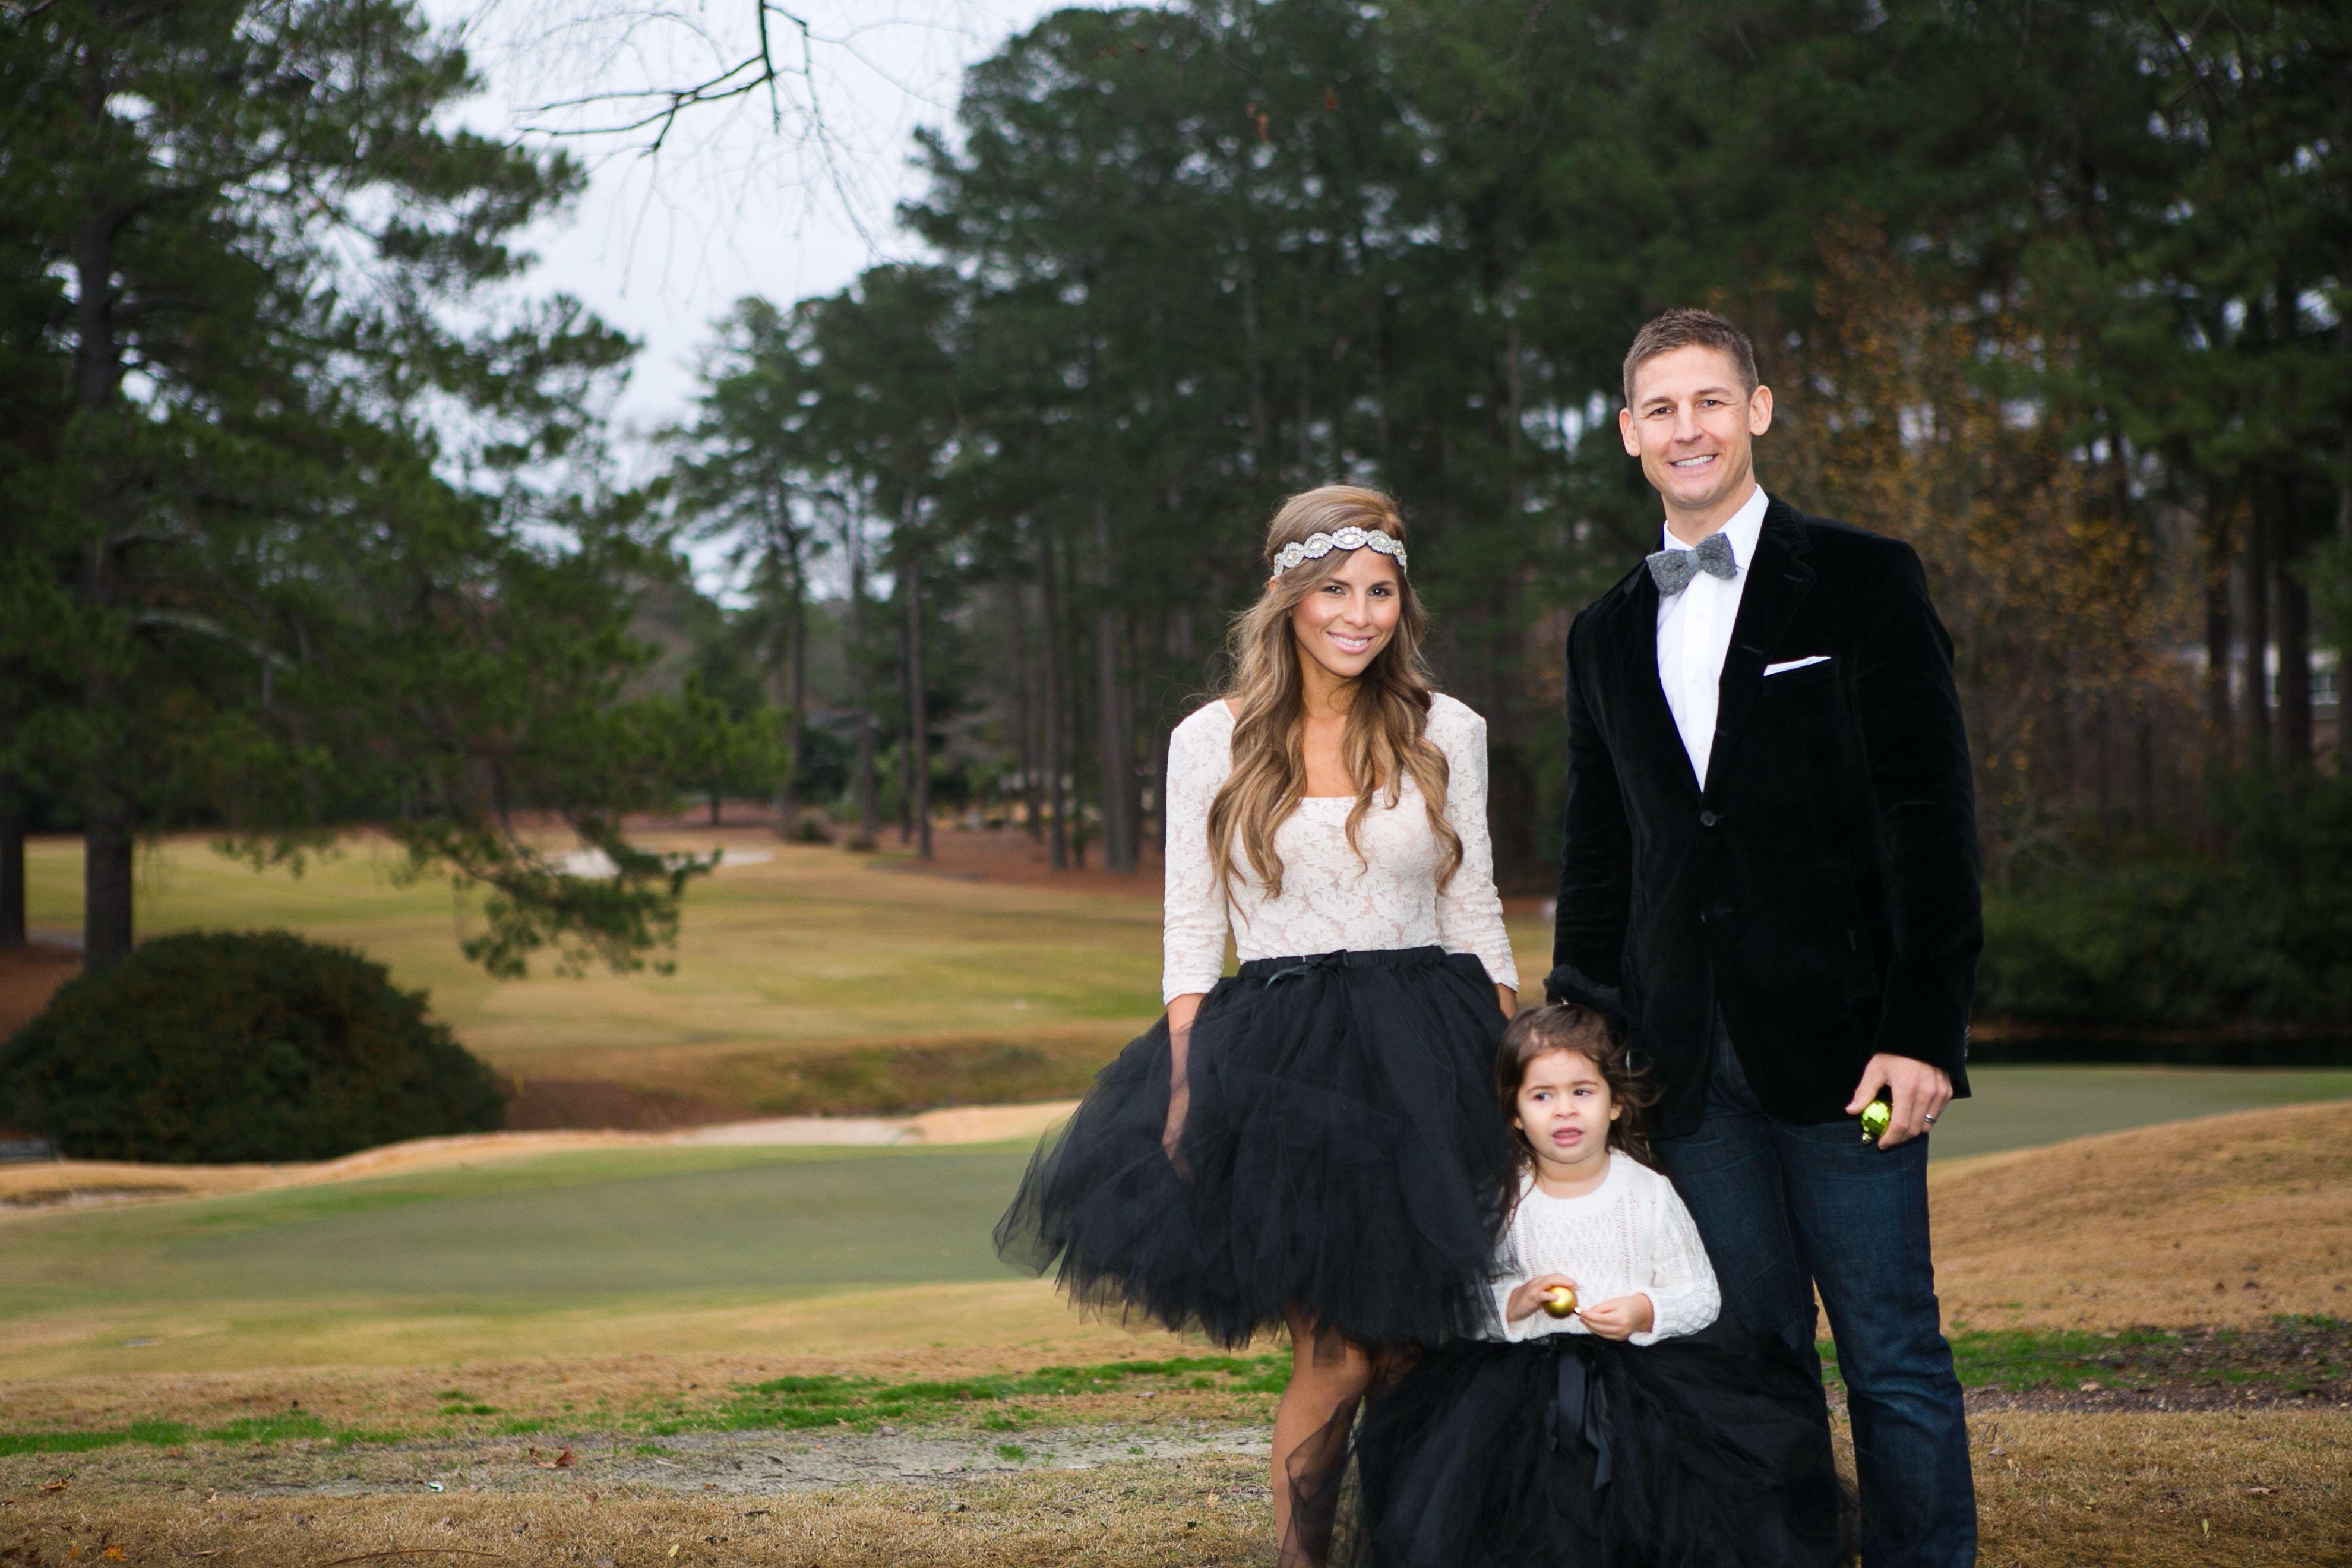 Tulle Skirt In Black Family Photos Photography Poses Family Photos Photoshoot